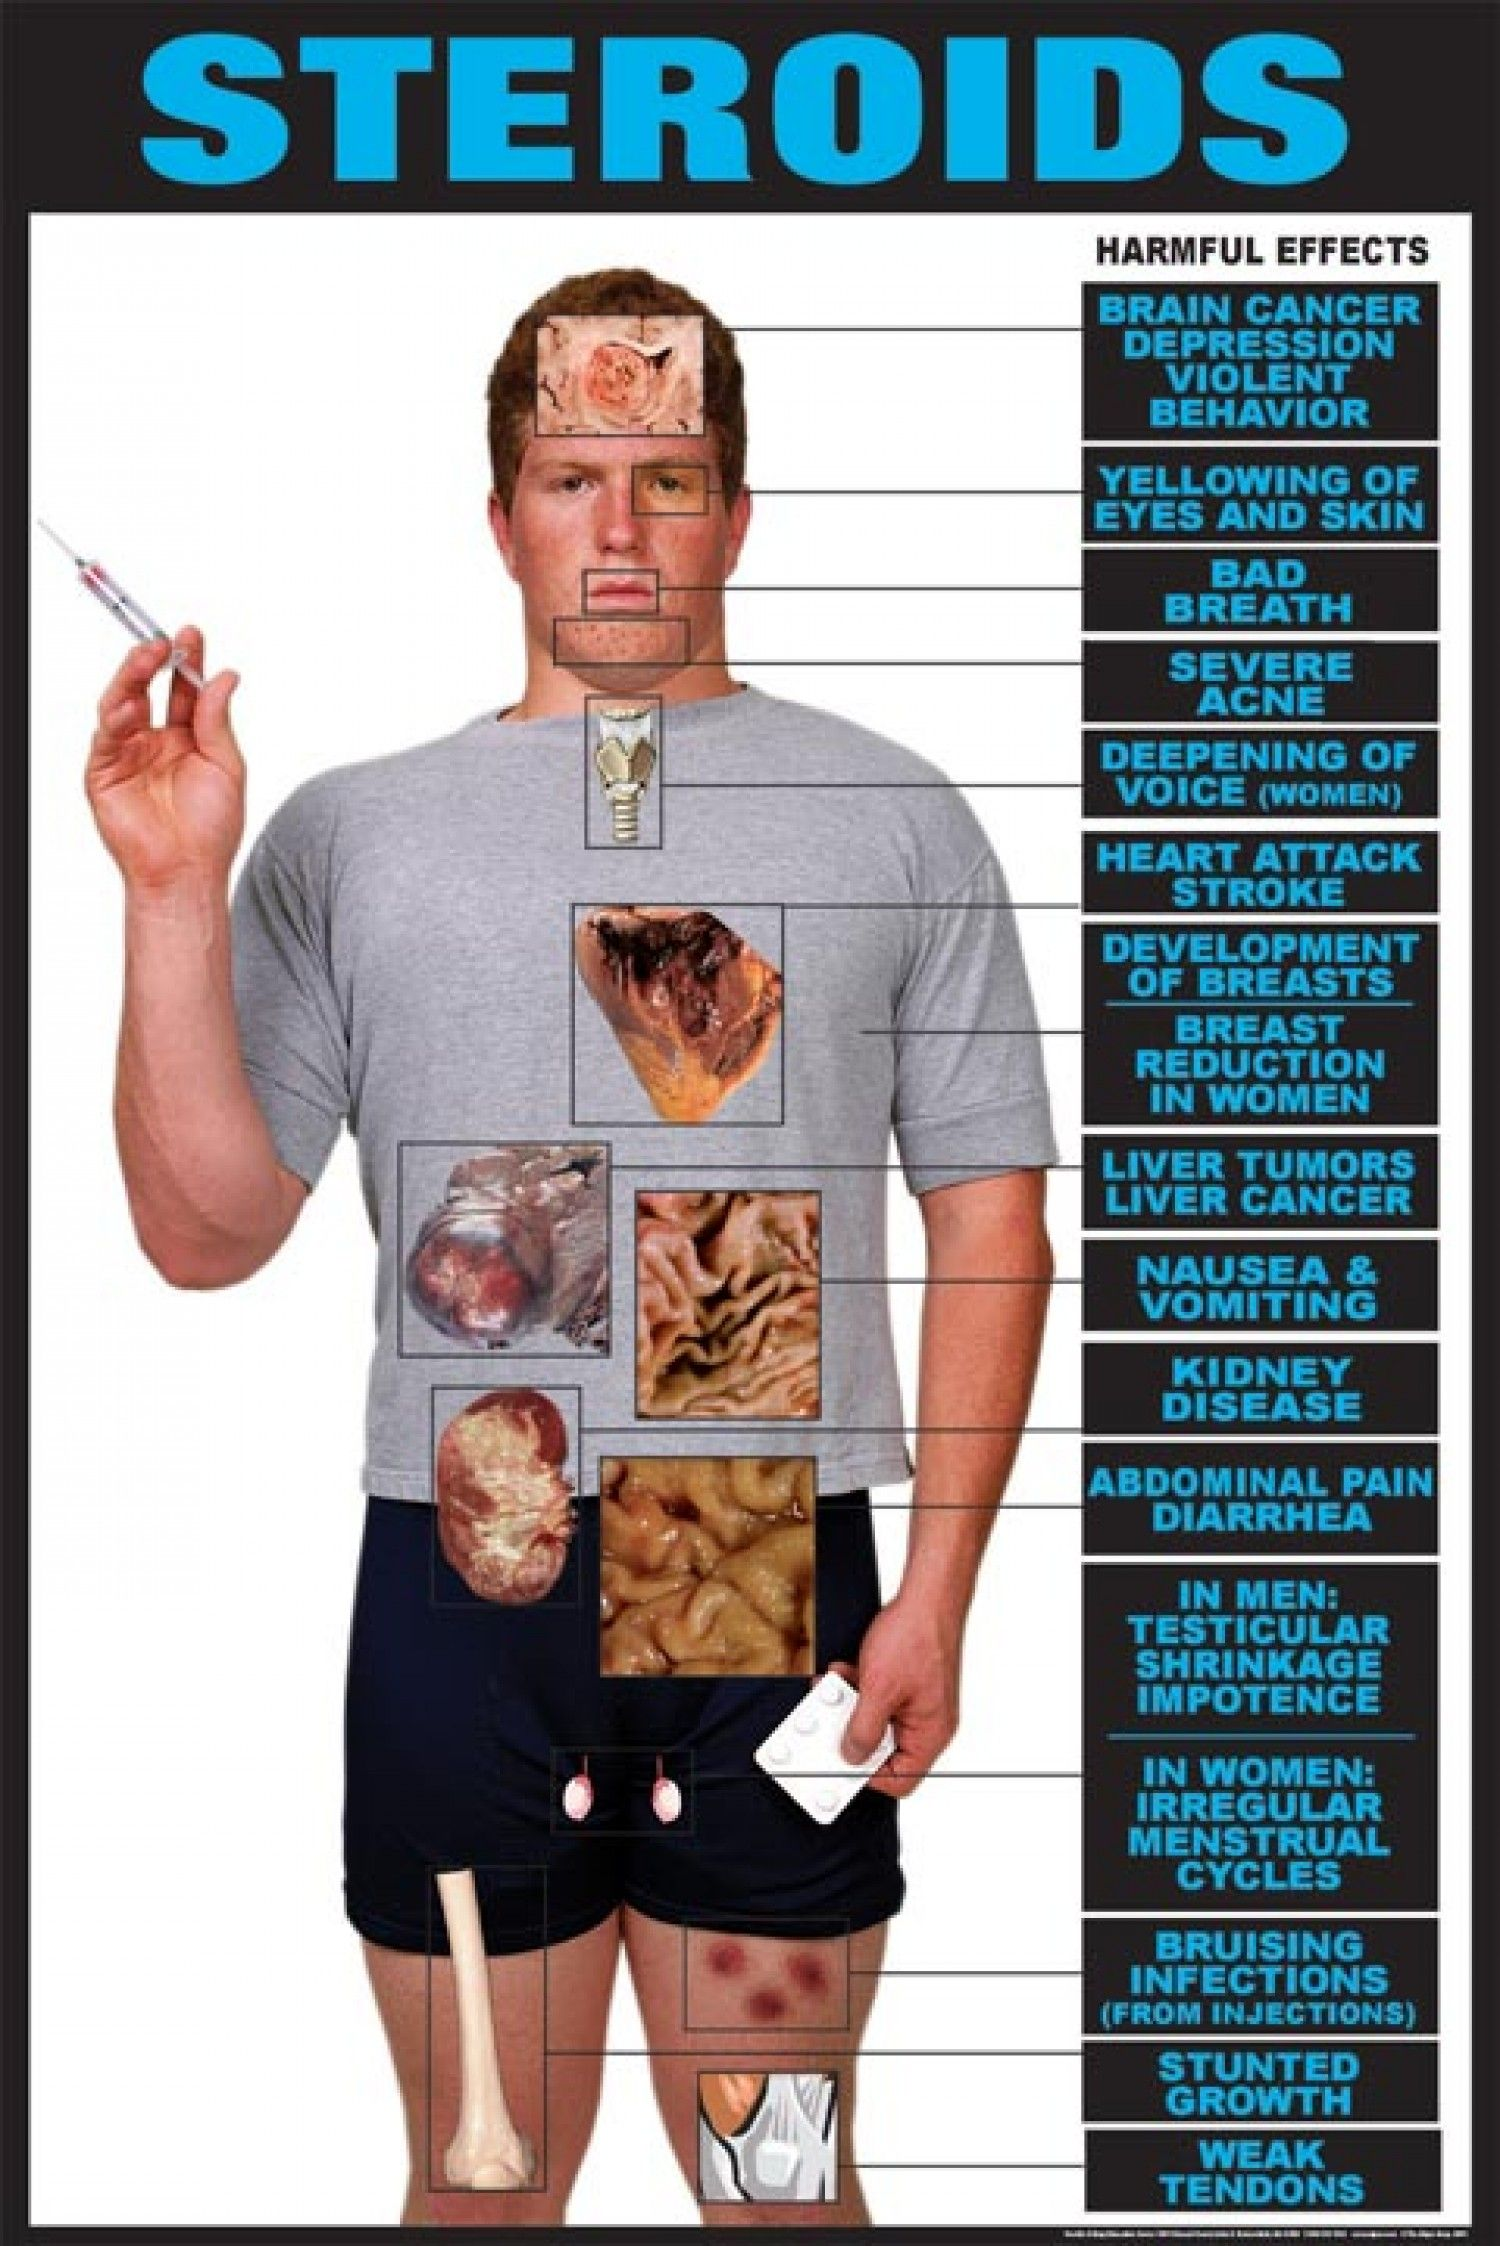 Effect of steroids on esr mazatek steroids